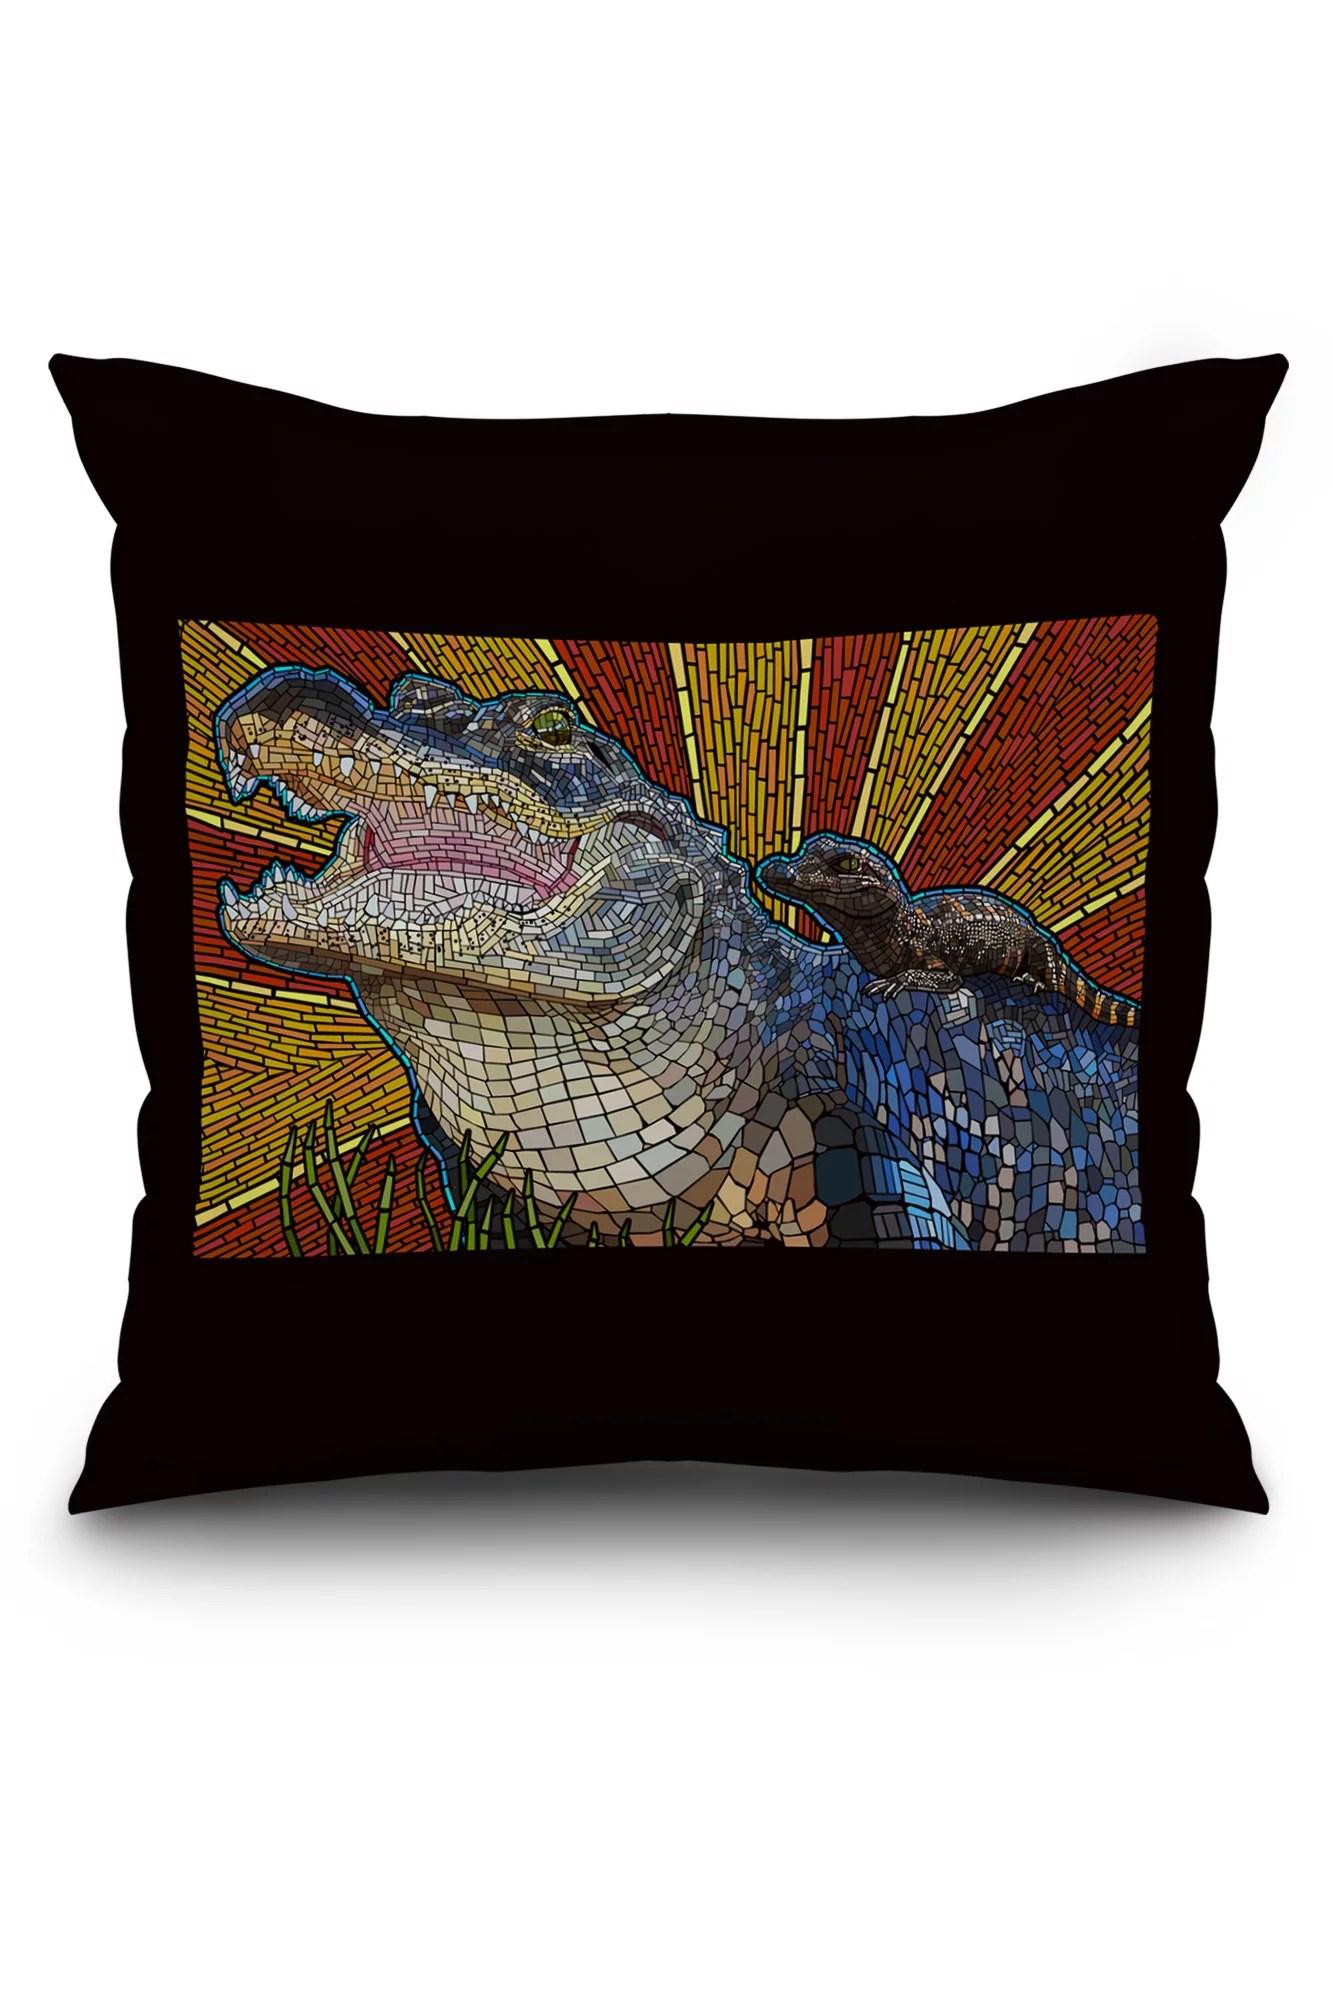 Alligator  Paper Mosaic  Lantern Press Artwork 20x20